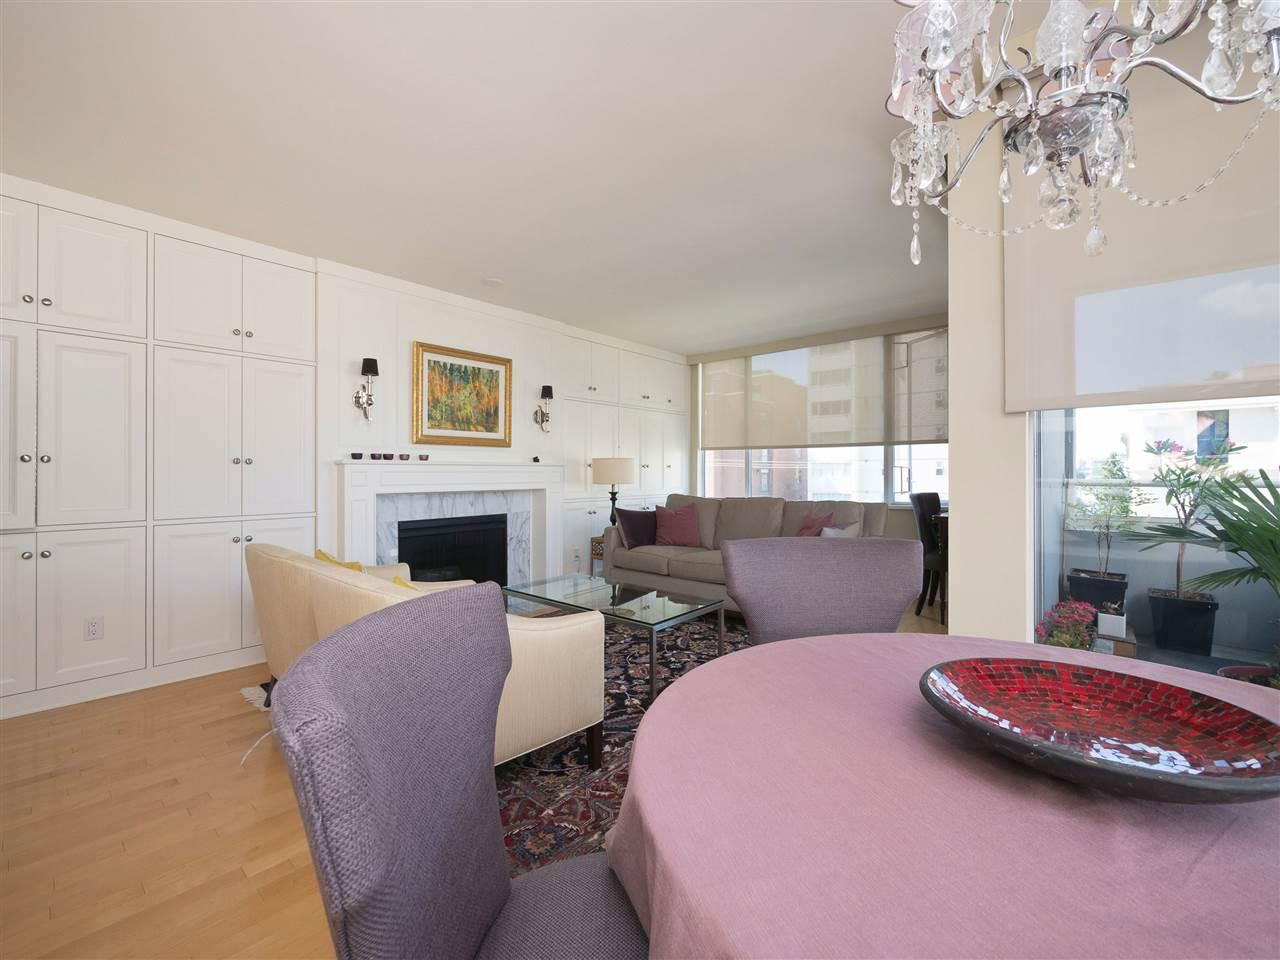 Condo Apartment at 303 1436 HARWOOD STREET, Unit 303, Vancouver West, British Columbia. Image 2